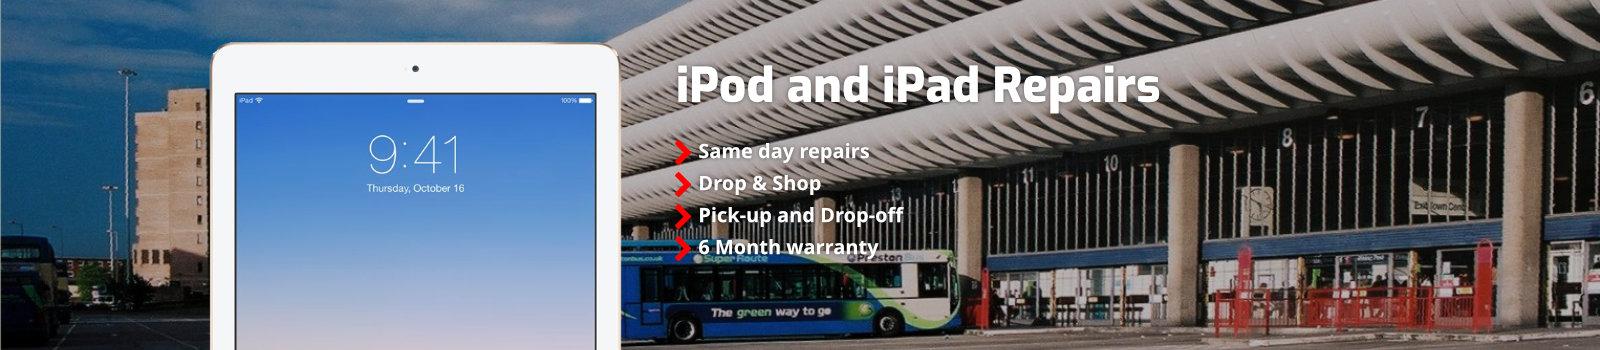 Ipad Ipod Repairs